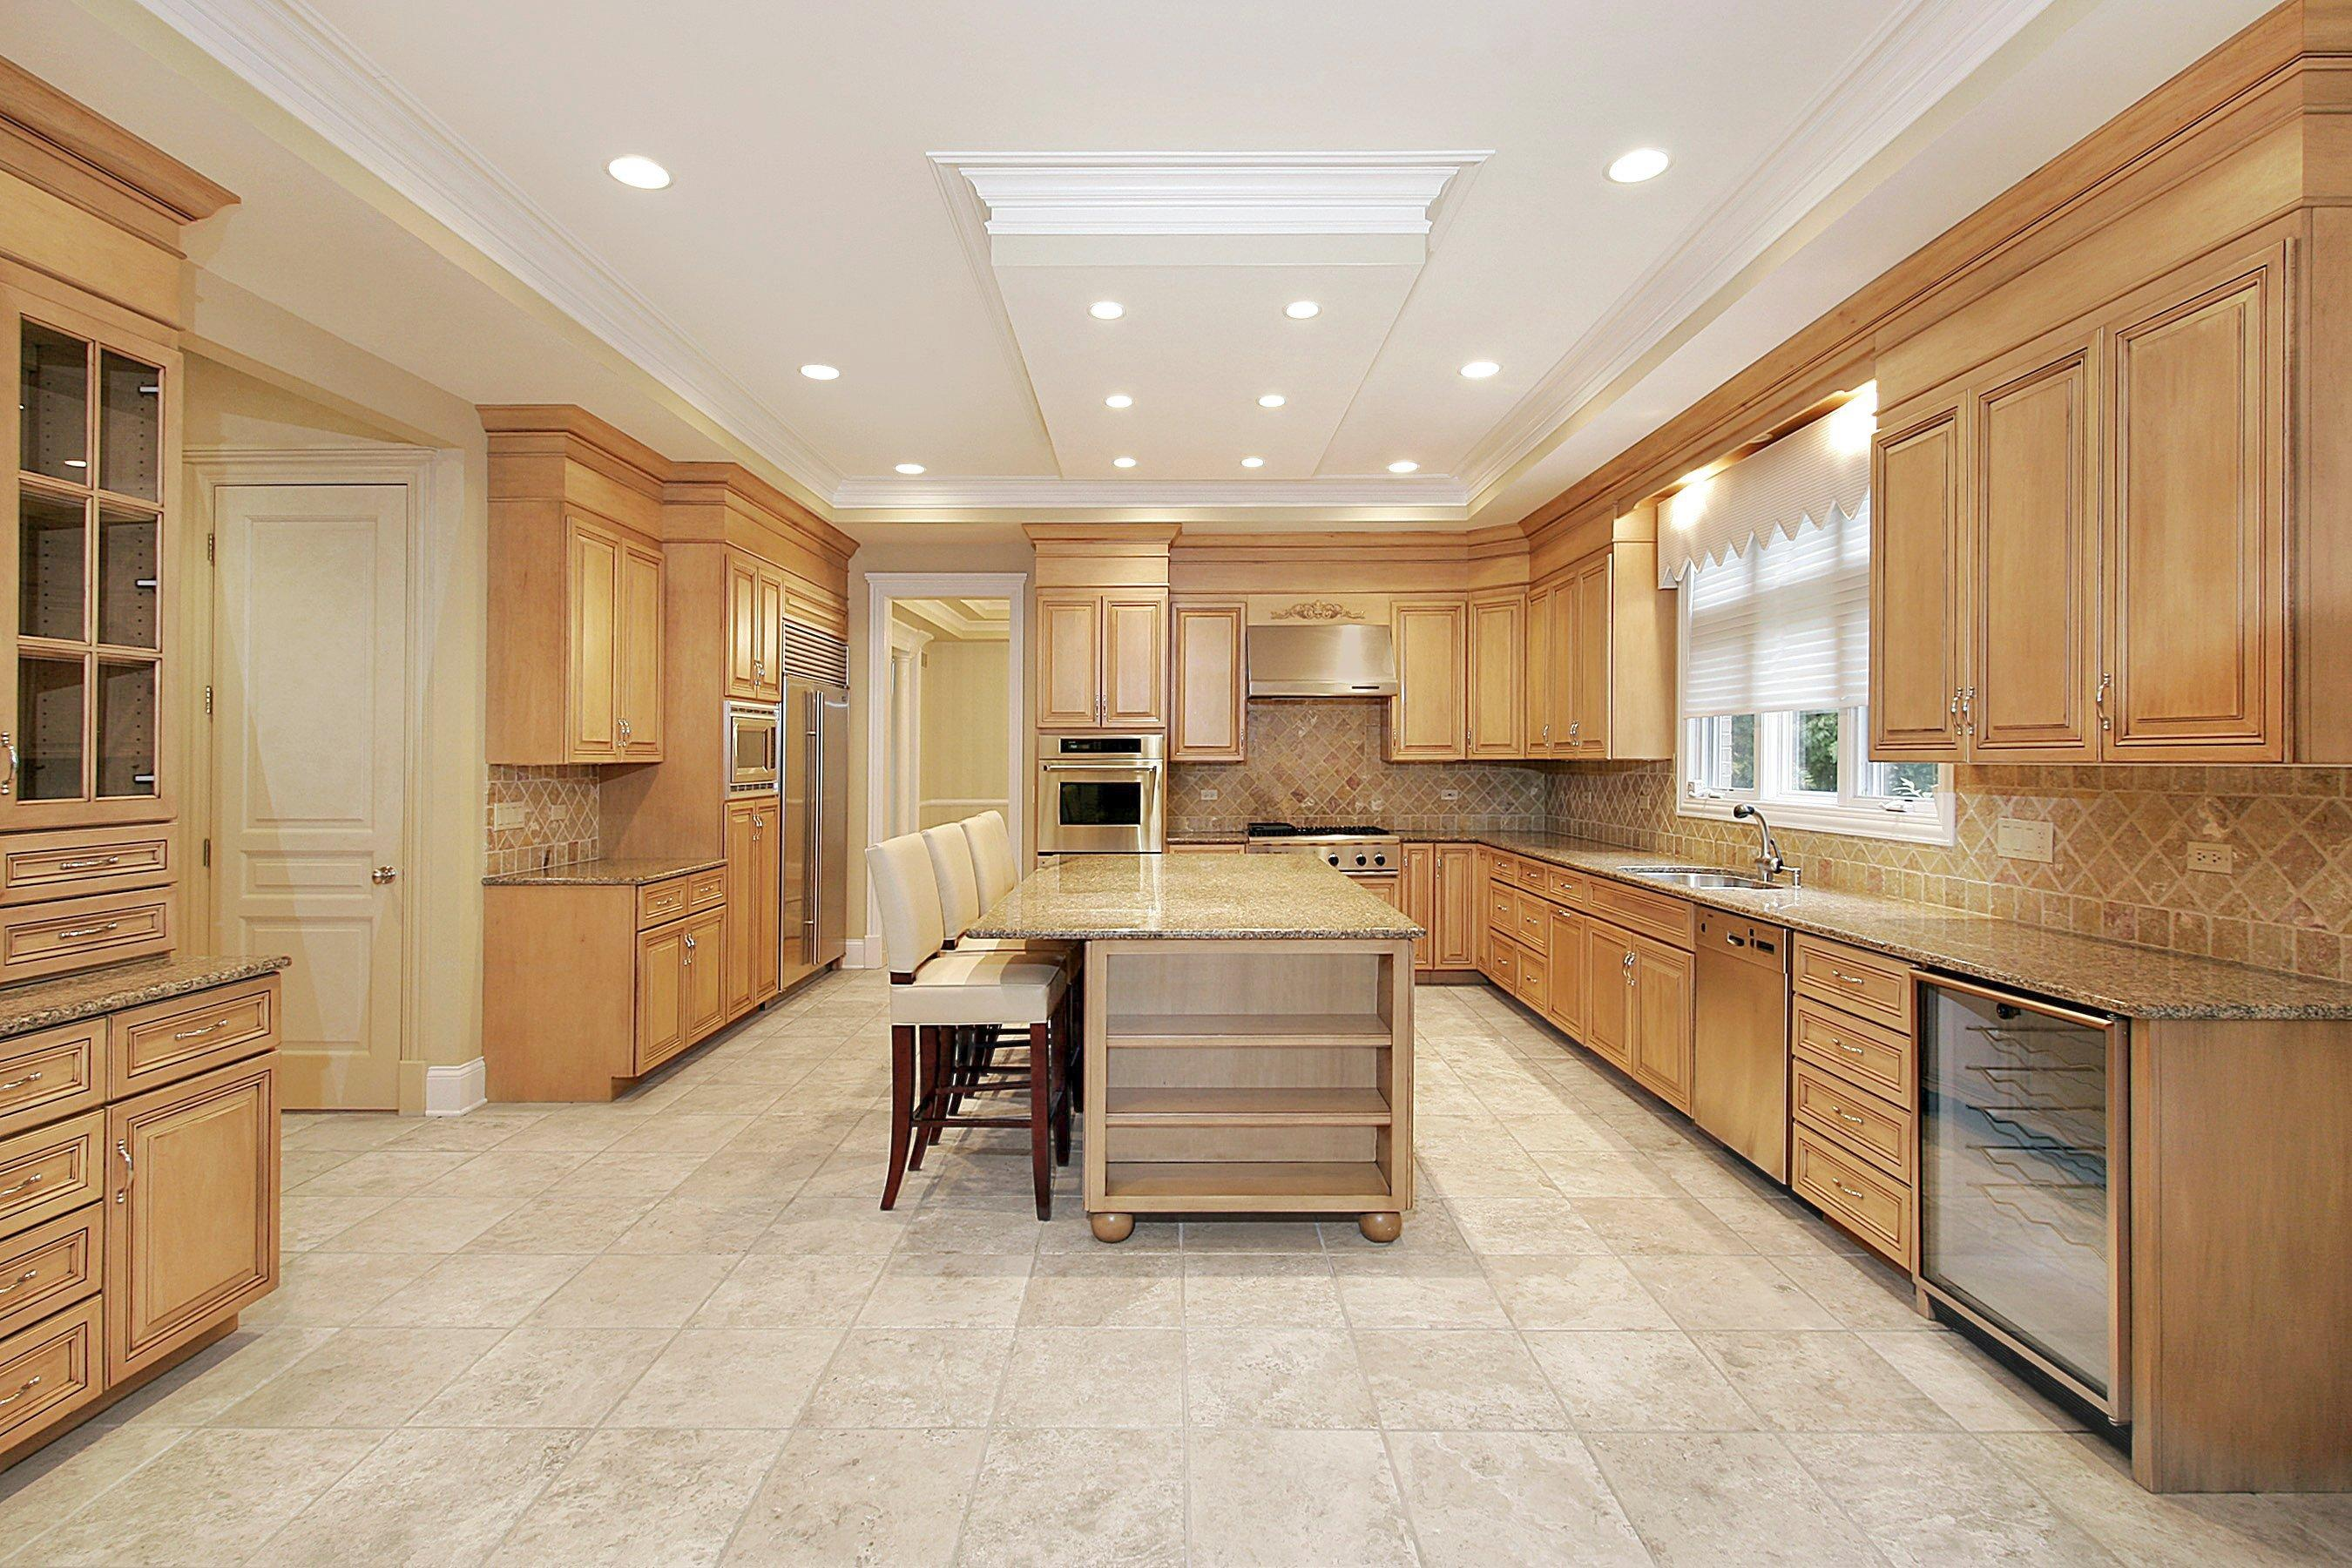 Travertine Tile For Kitchen Travertine Tile Kitchen Floor Kitchen Backsplash Pictures